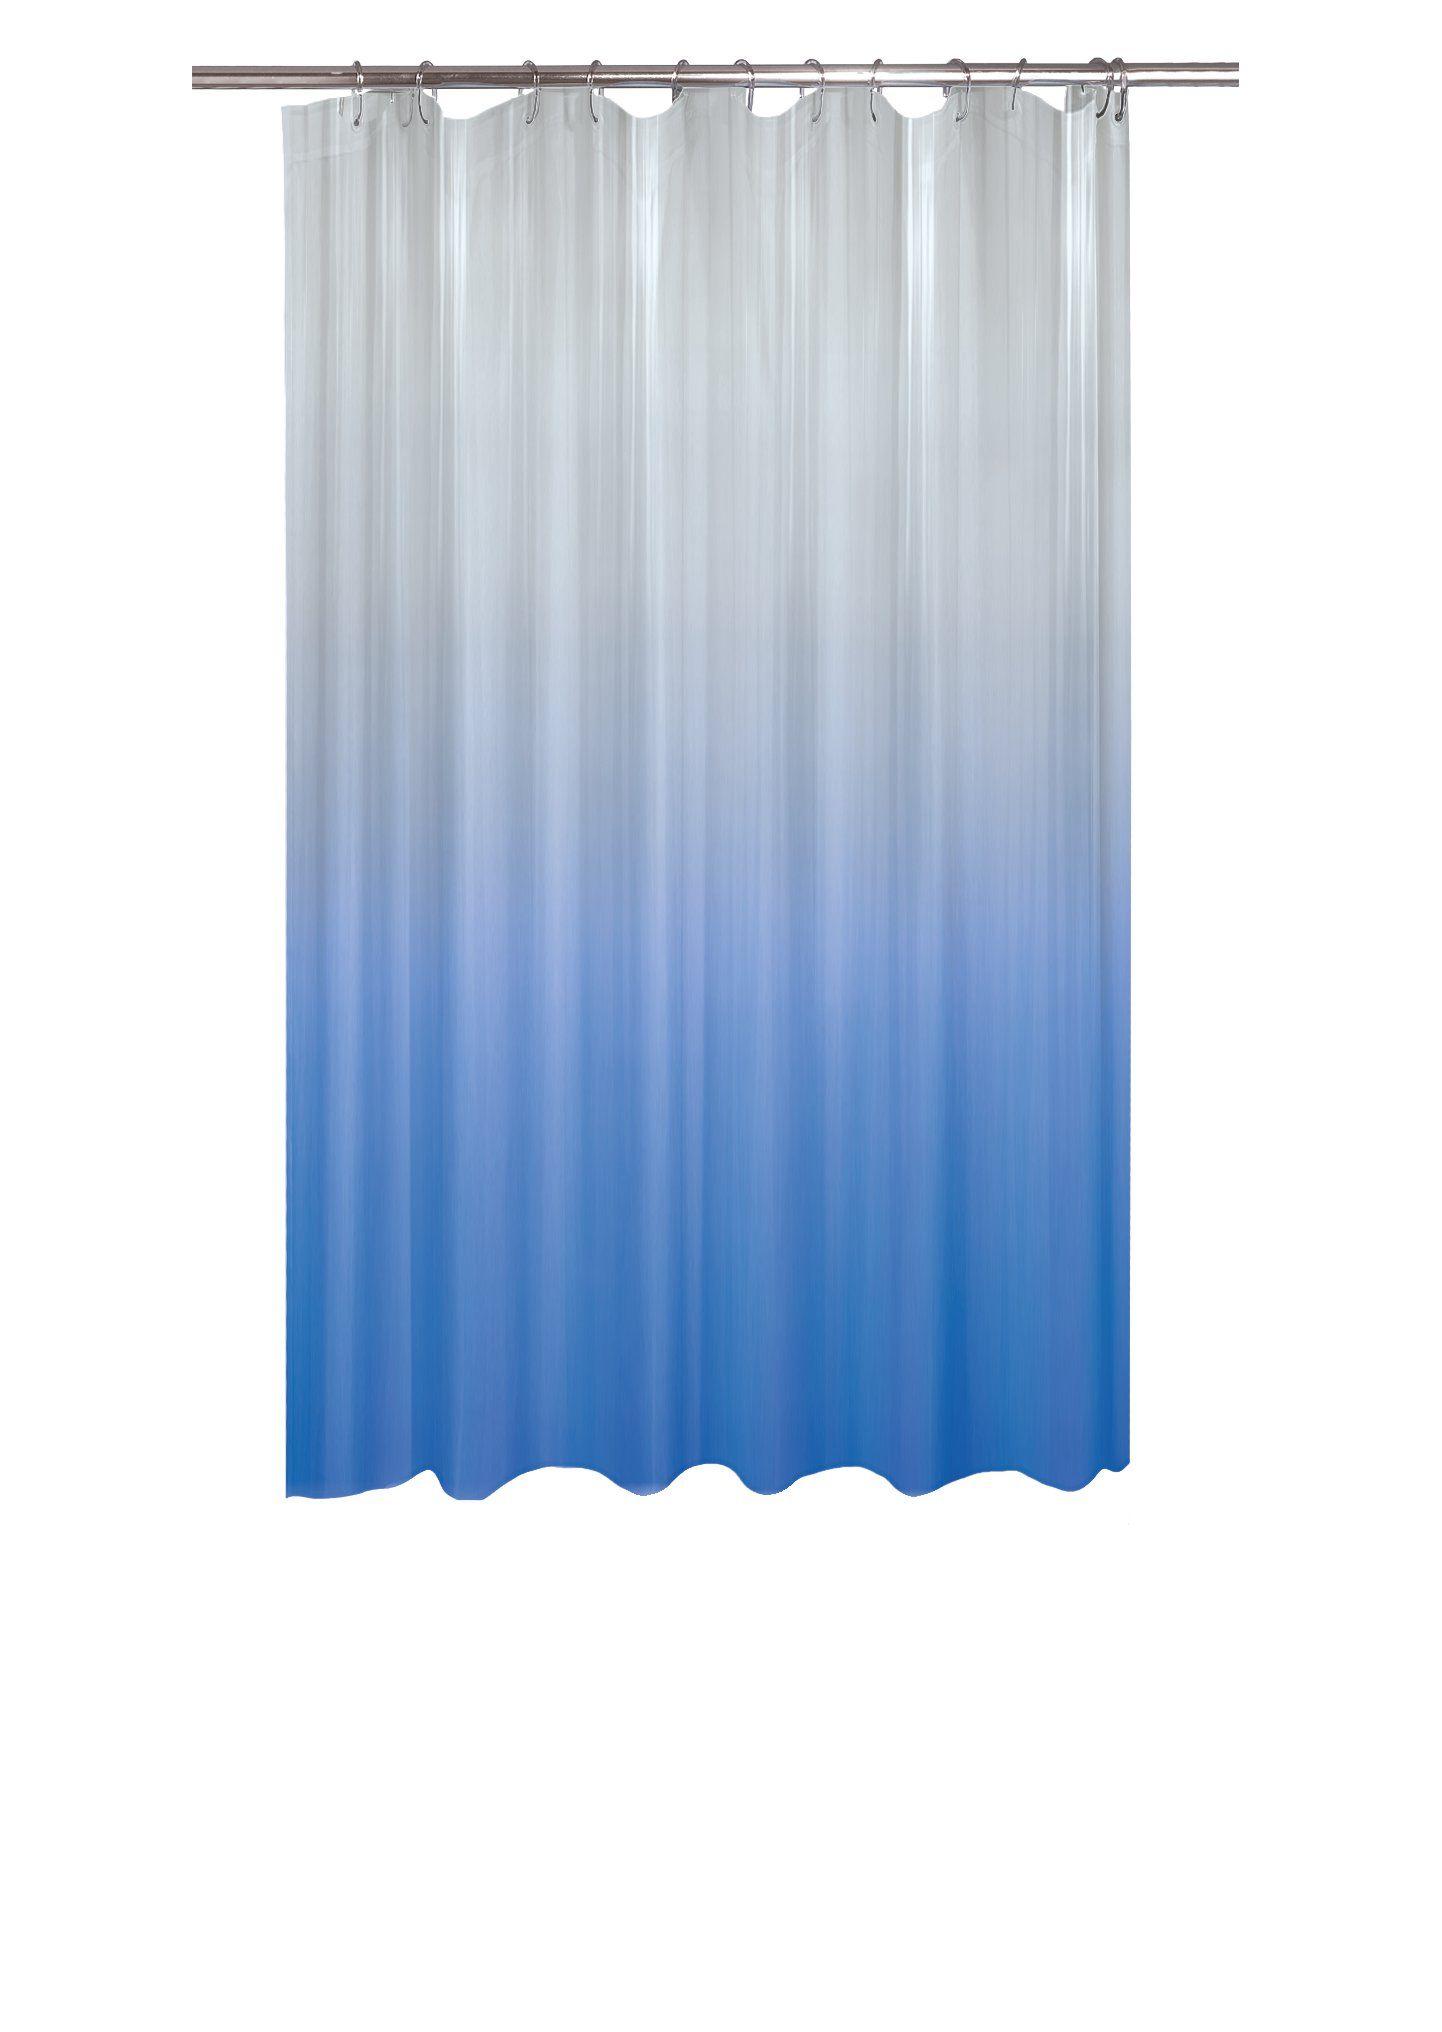 Duschvorhang SEGUNDA Blau B 180 H 200 cm Duschvorhänge Micasa